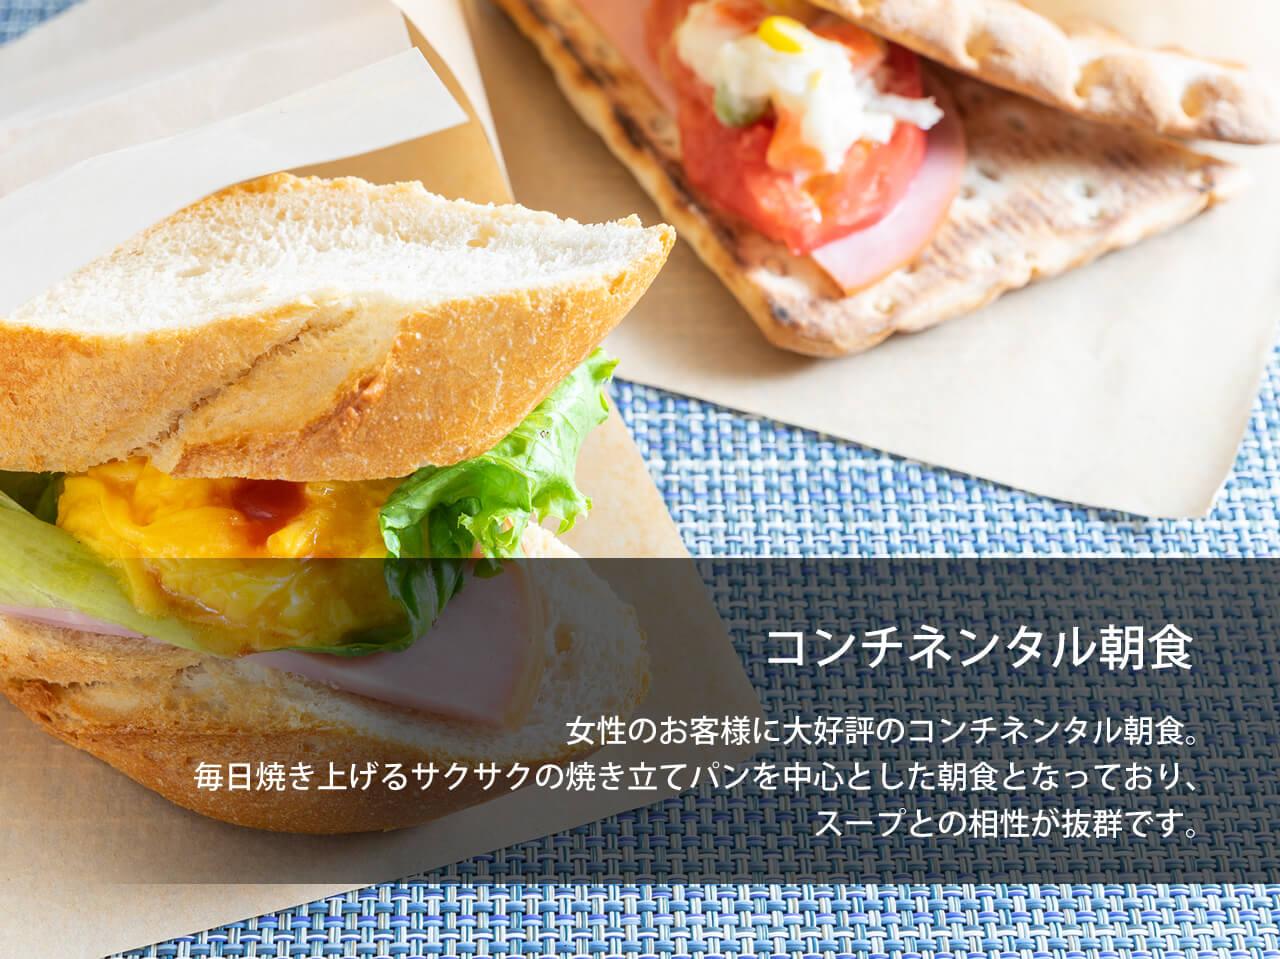 Super Hotel Shinagawa Shimbamba